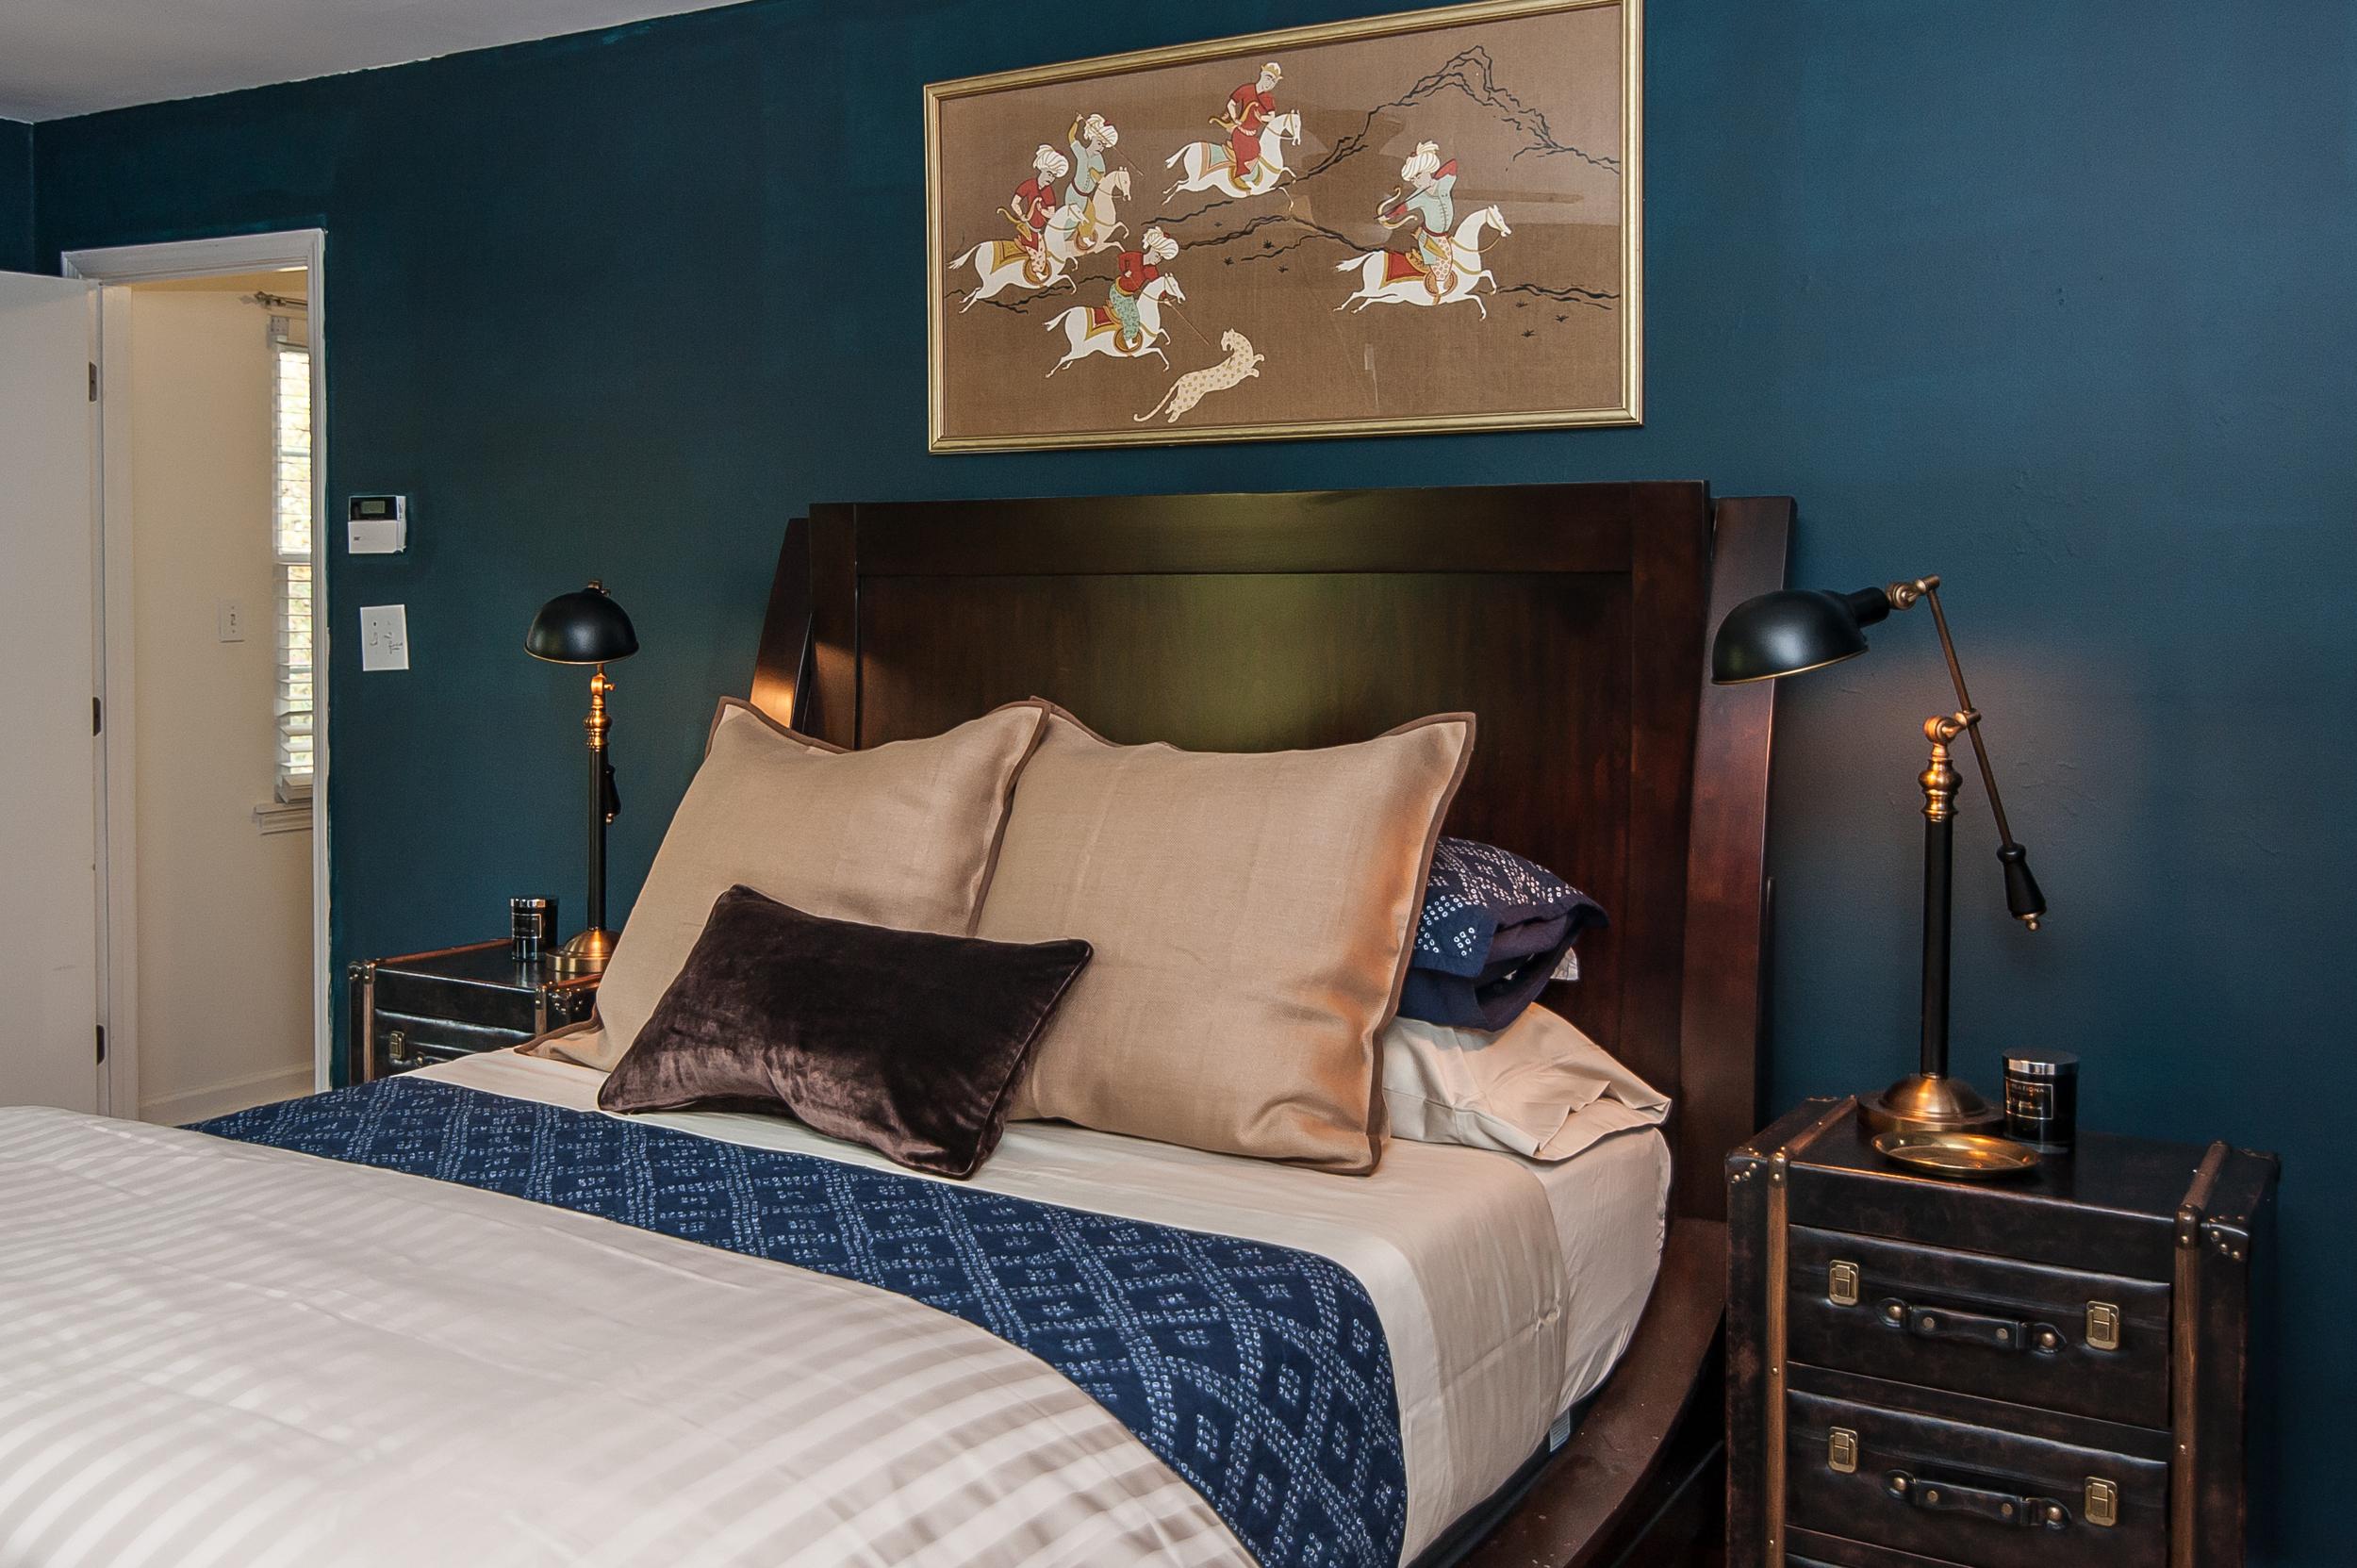 Artful Interiors - Bachelor Pad - Master Bedroom